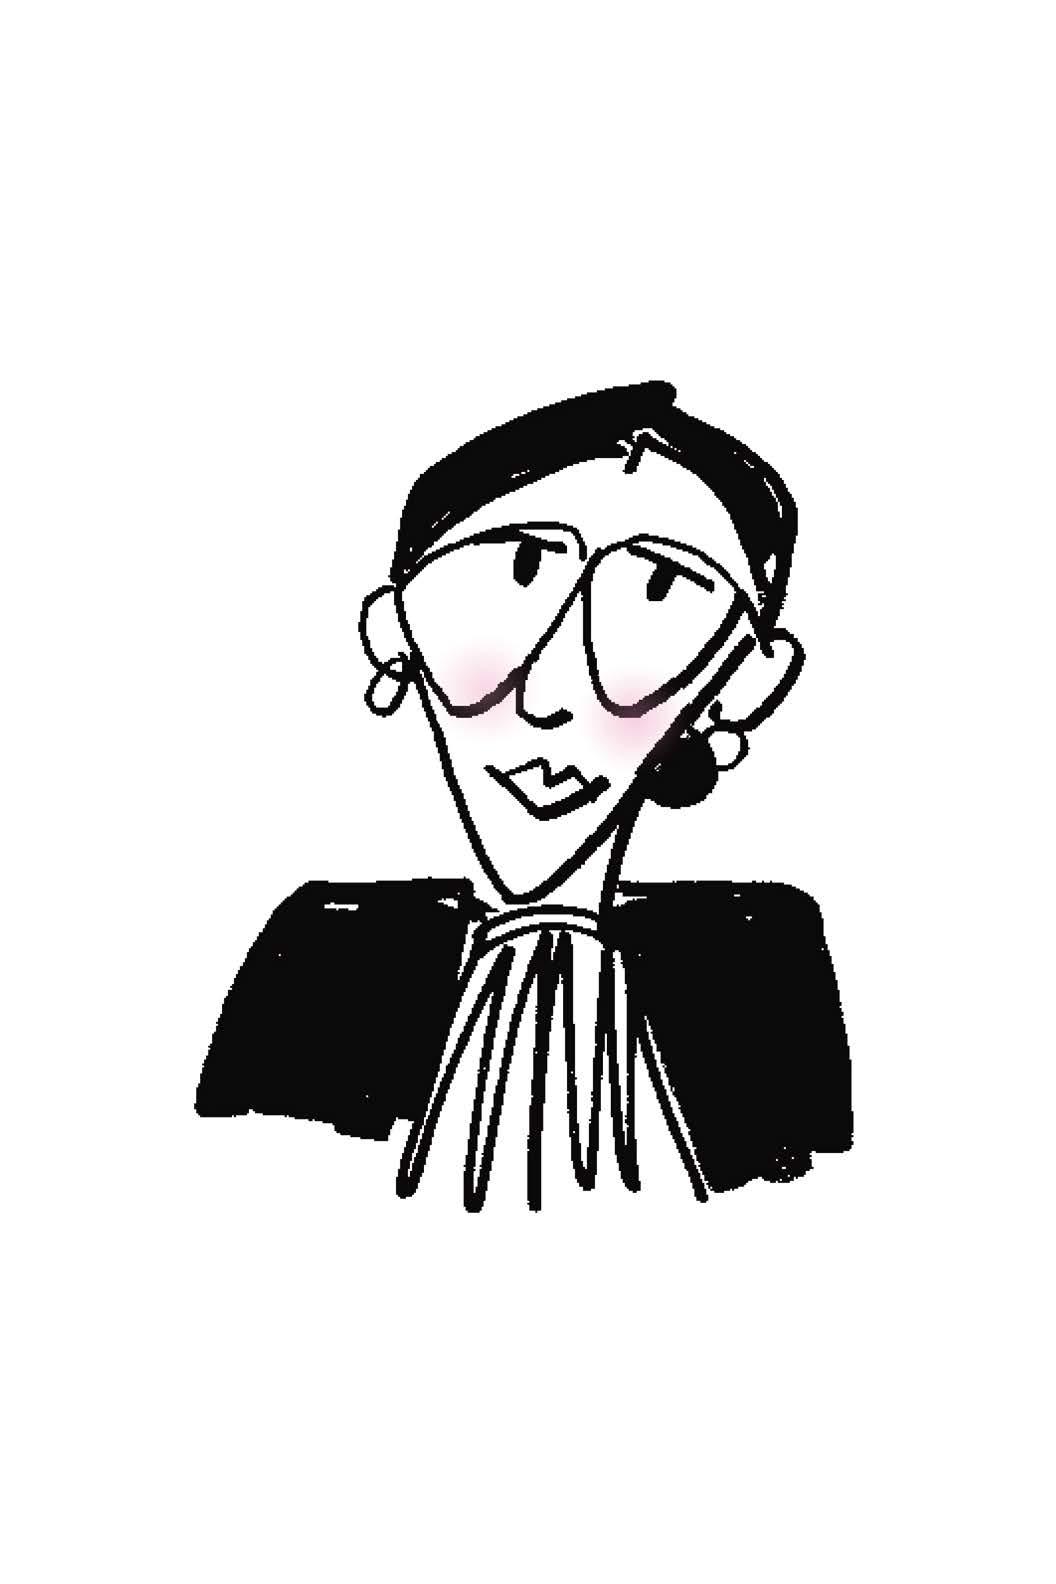 Portrait of Ruth Bader Ginsberg